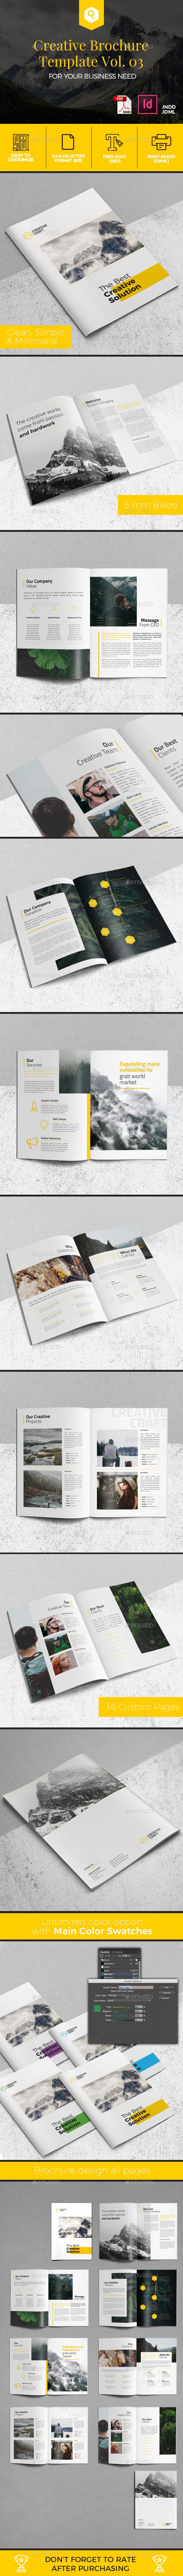 Creative Brochure Template Vol. 03 - Corporate Brochures